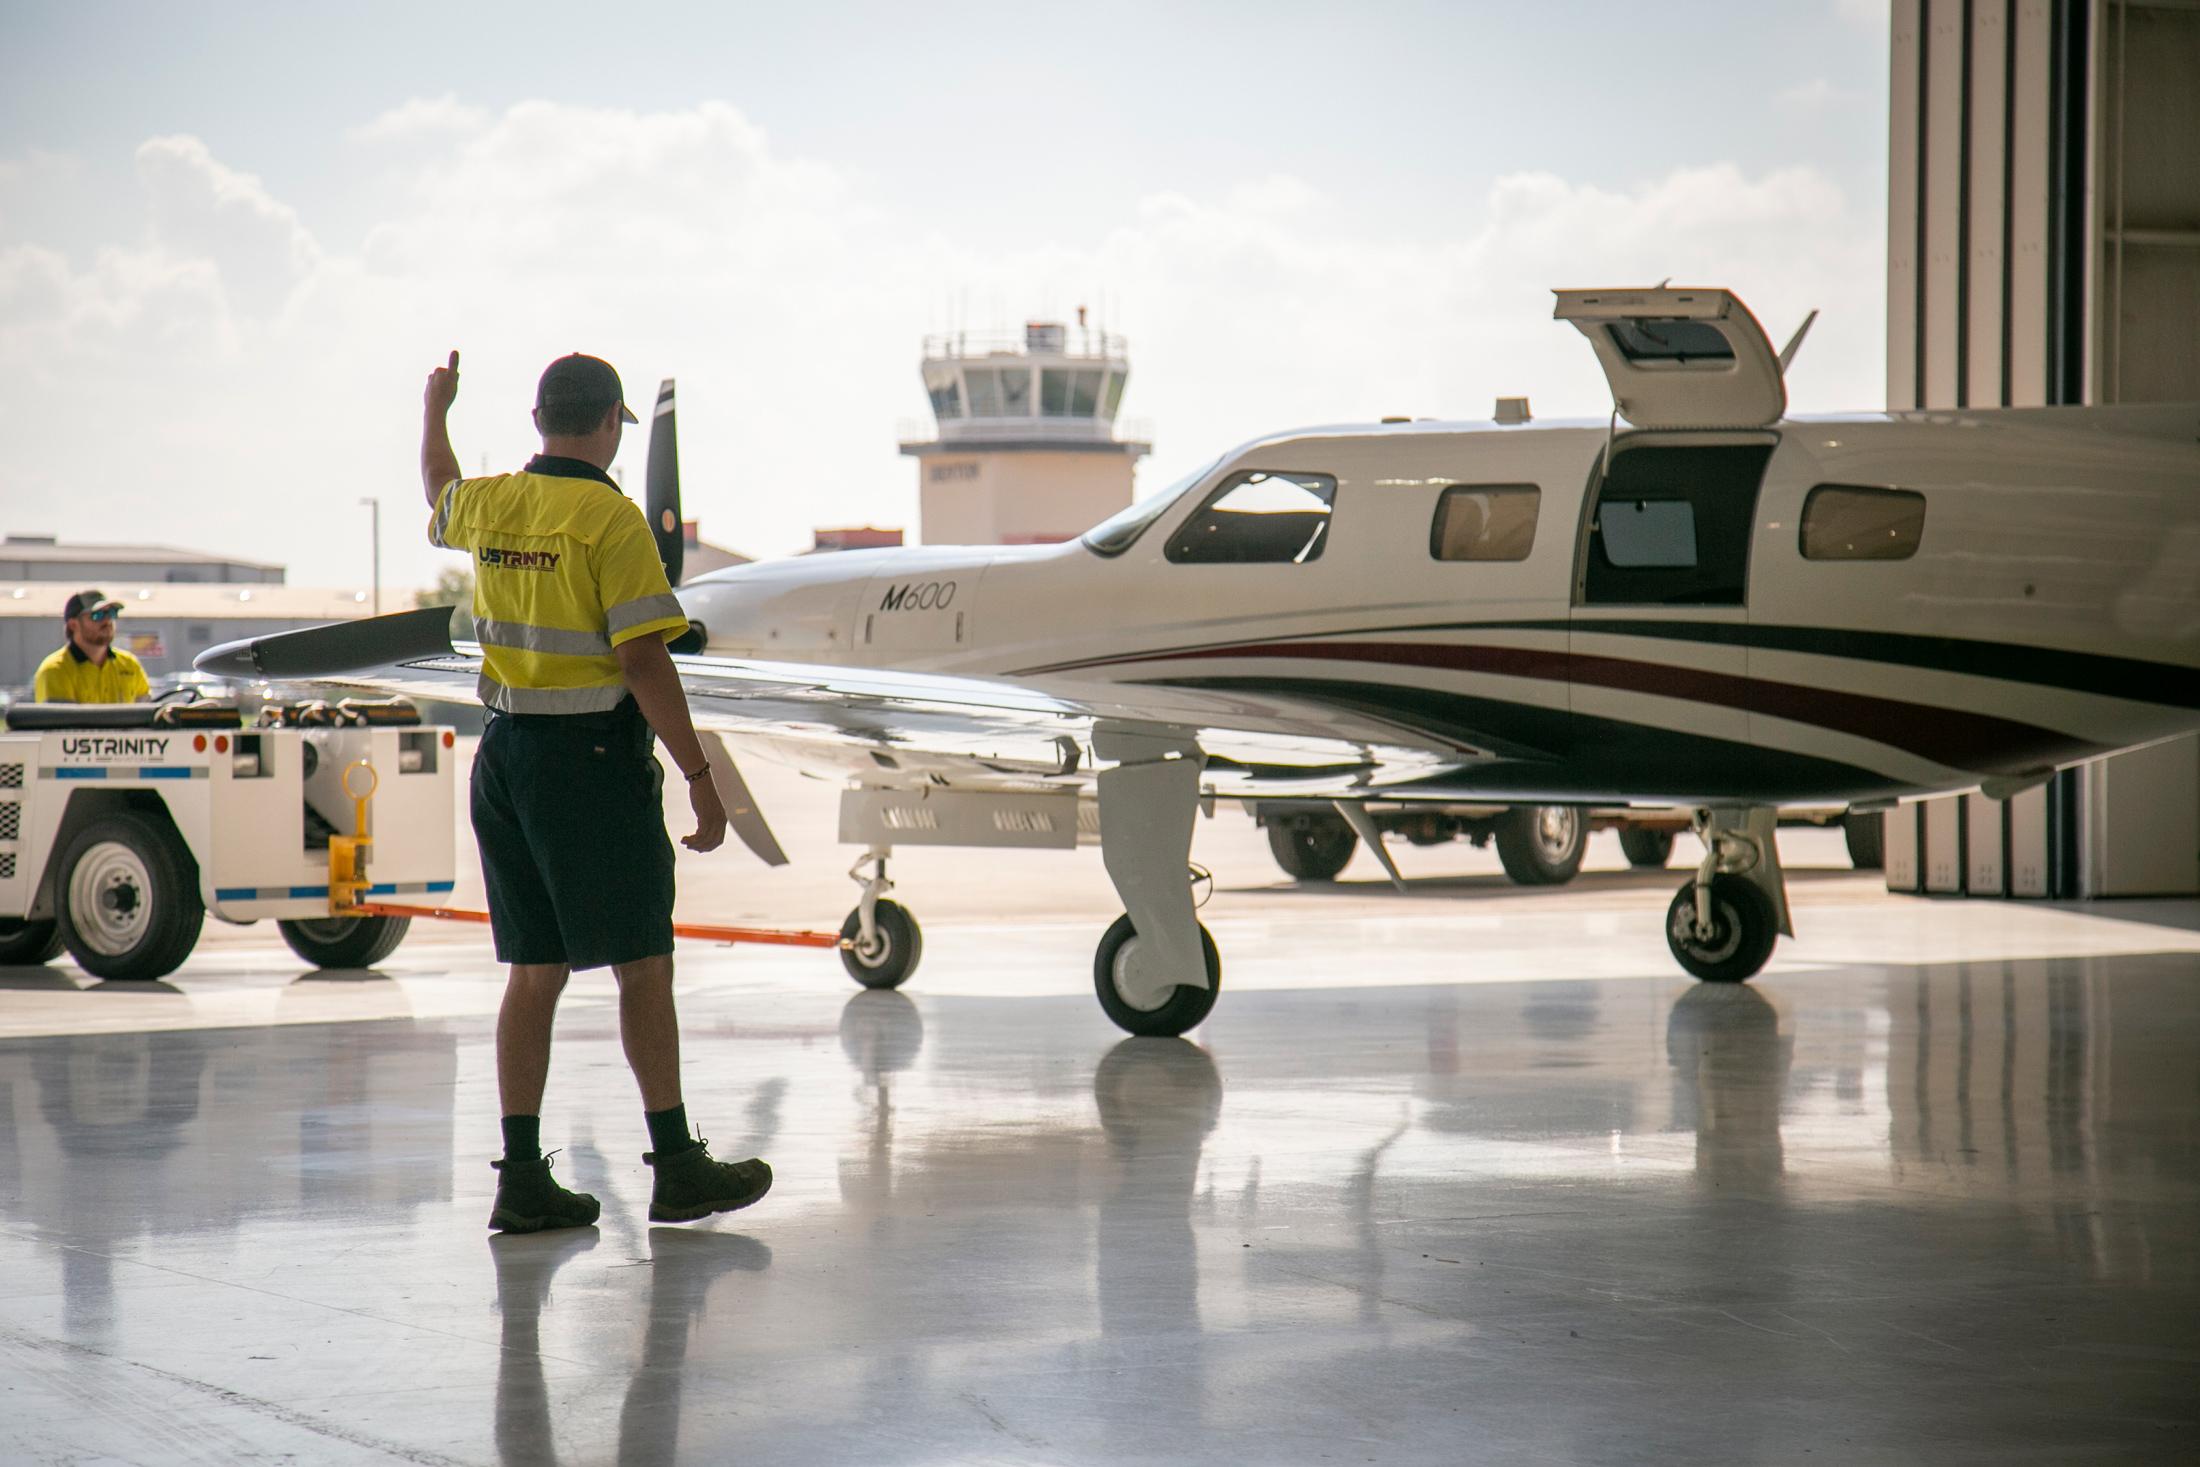 Wingwalker assisting aircraft movement